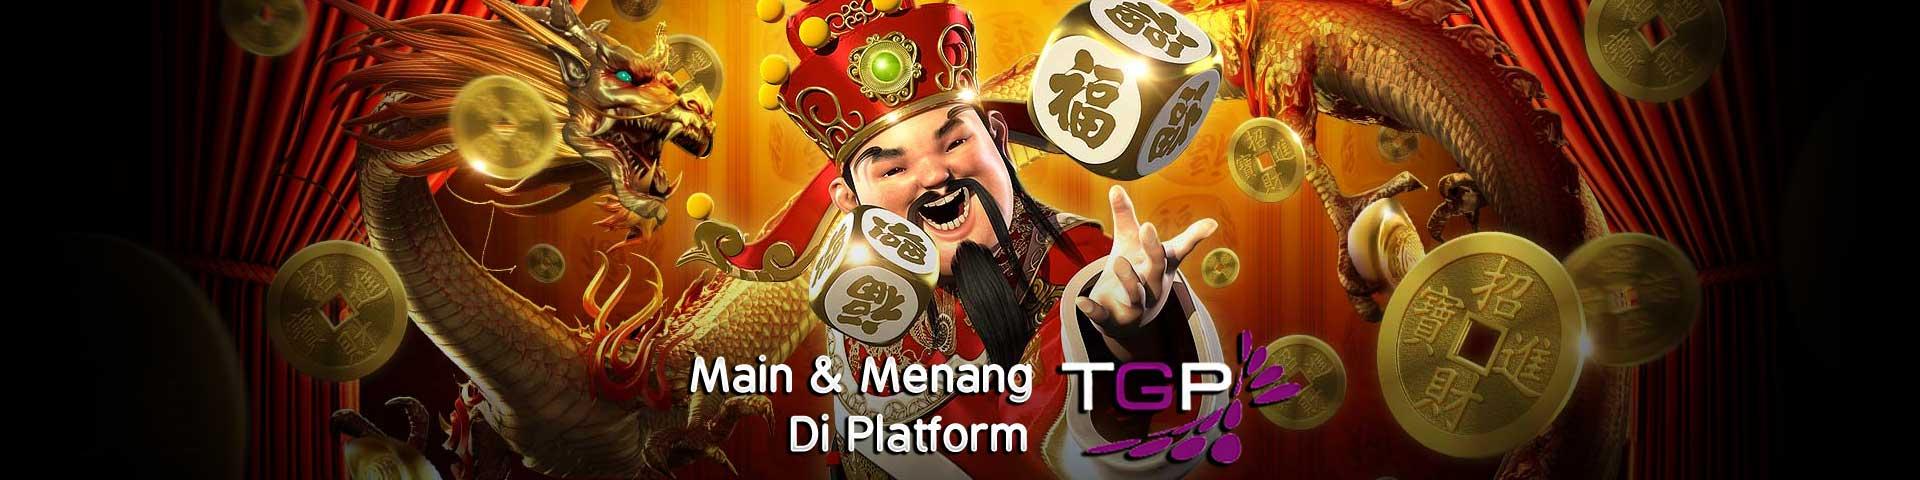 TGP - The Gaming Platform Game Slot Online Indonesia Terlengkap